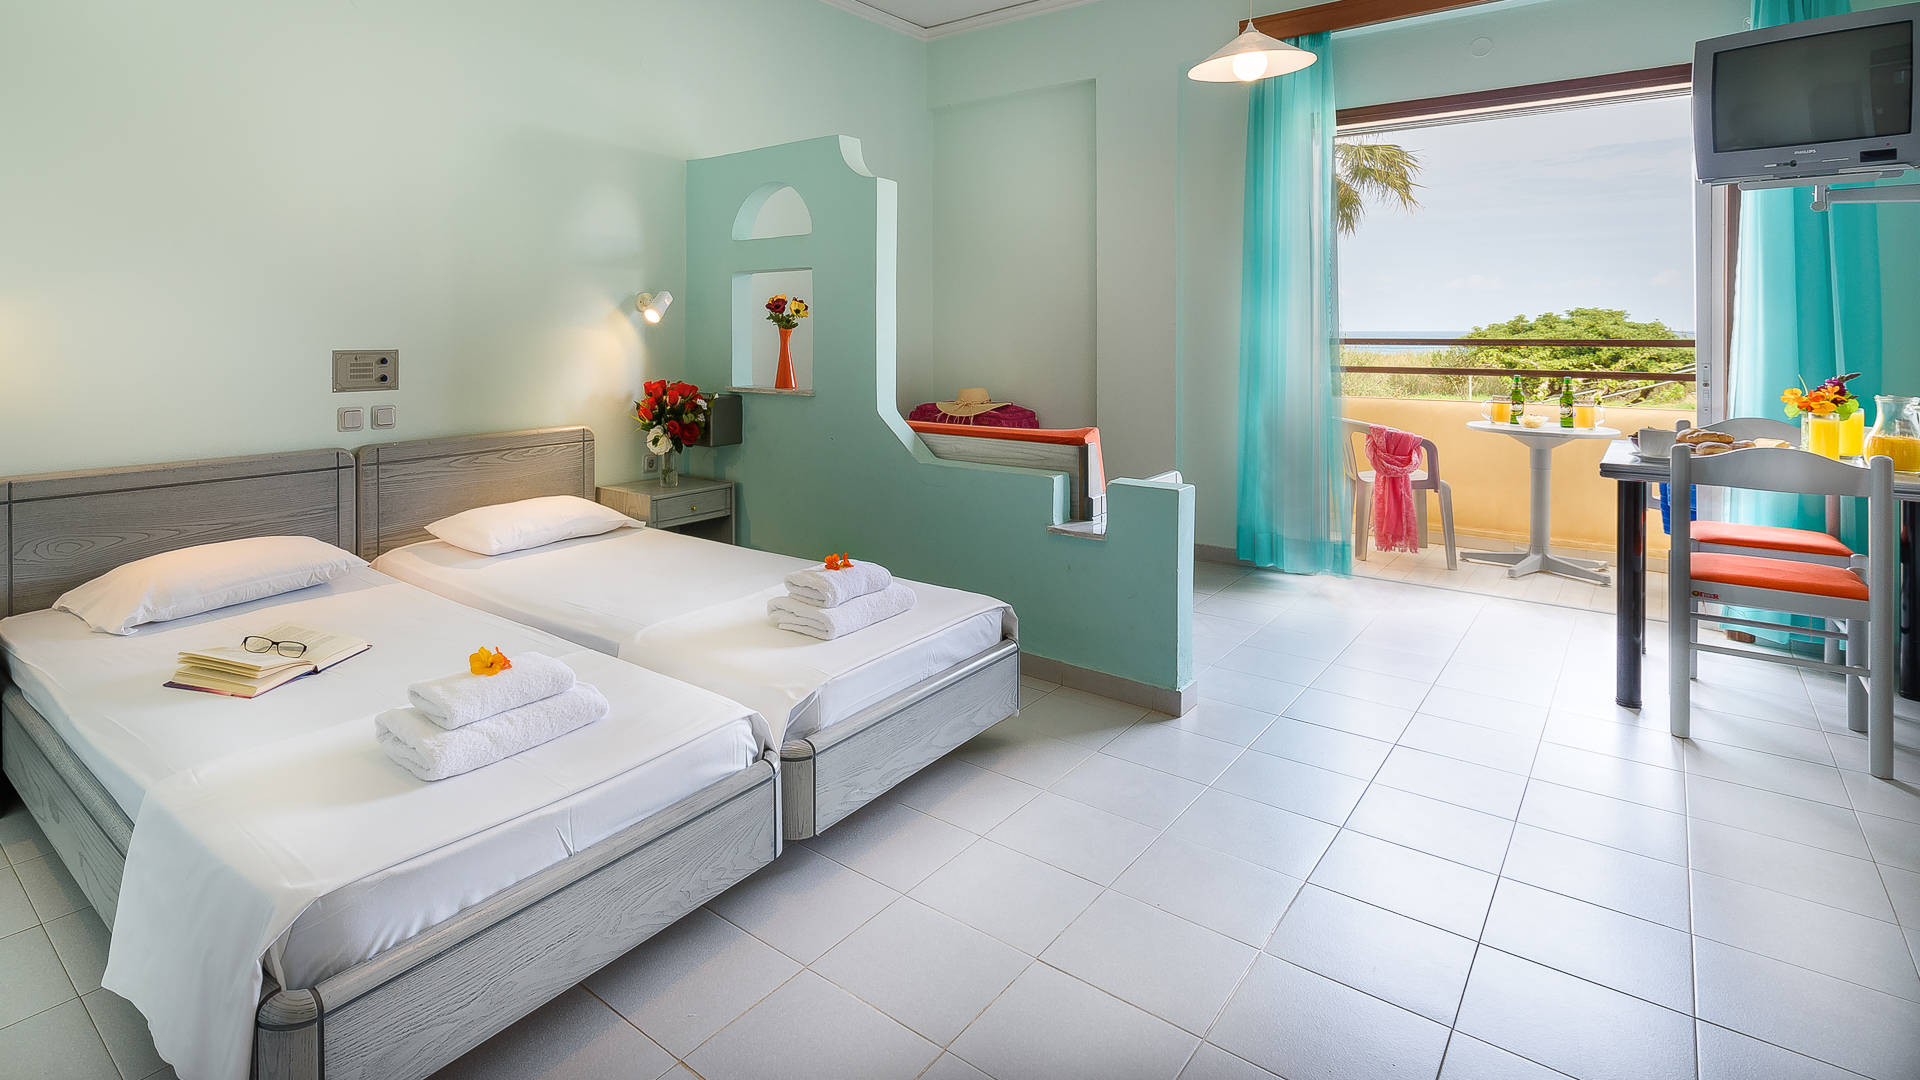 https://louladakis-apts.gr/wp-content/uploads/2017/04/louladakis_apts_double_room_with_sofa_bed.jpg